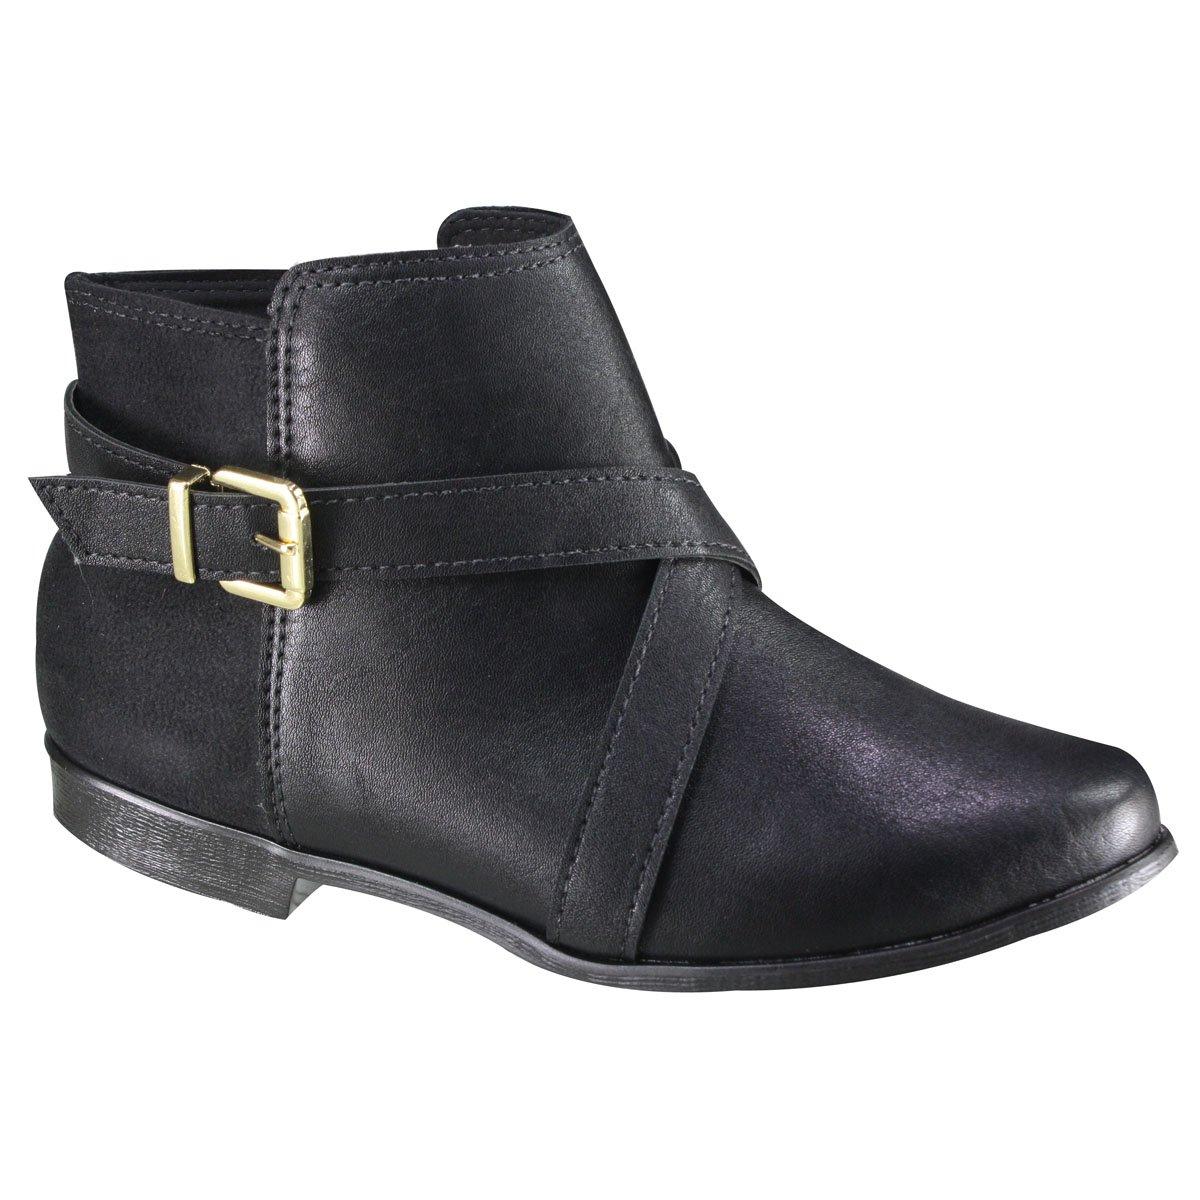 73c07ed6b Bota Ankle Boot Moleca 5304.119 17696 15745 - Preto (Napa Florenza ...